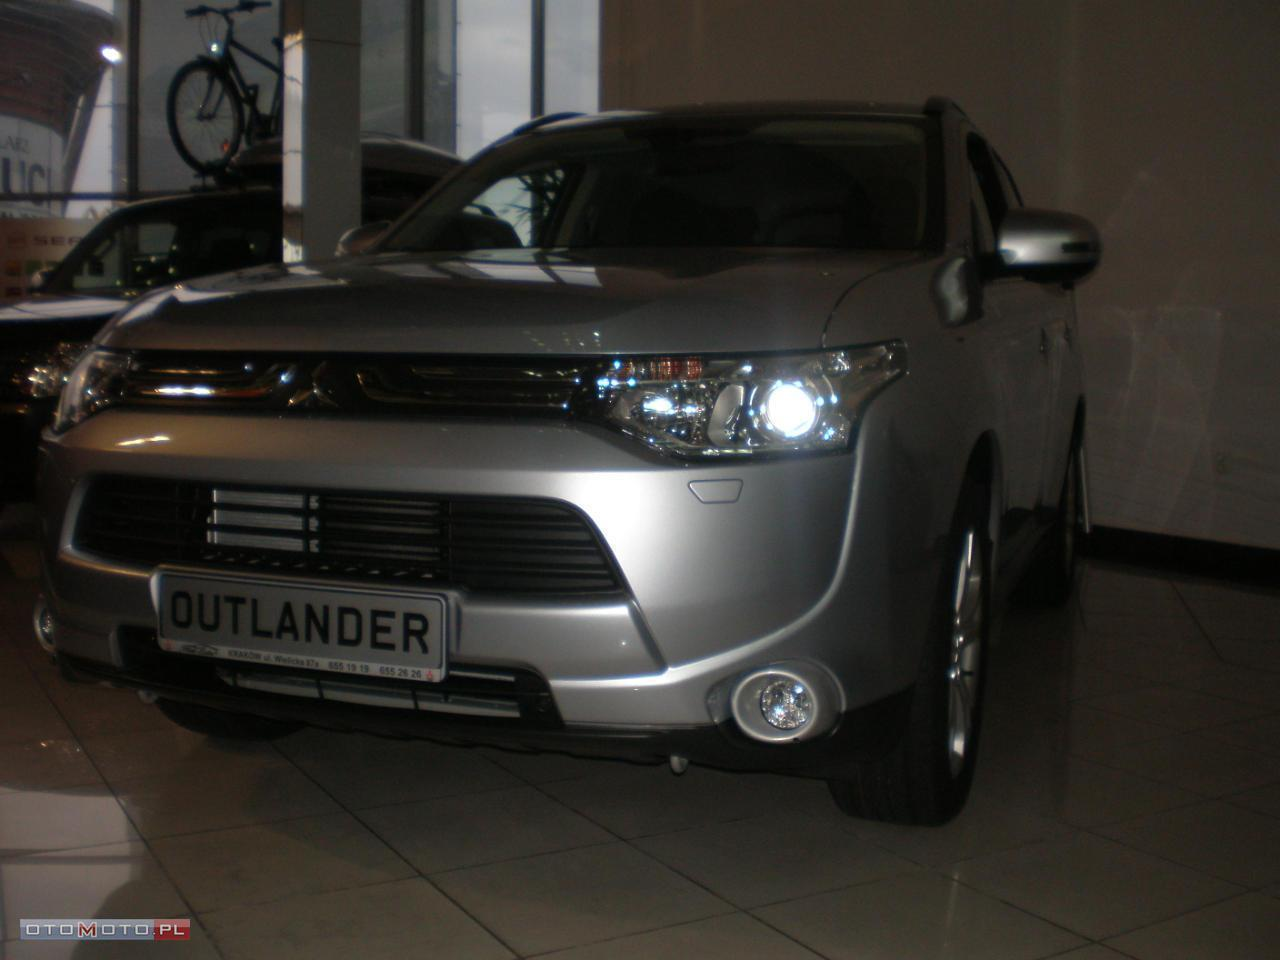 Mitsubishi Outlander 2.2 DIESEL INSTYLE NAVI 4WD AT